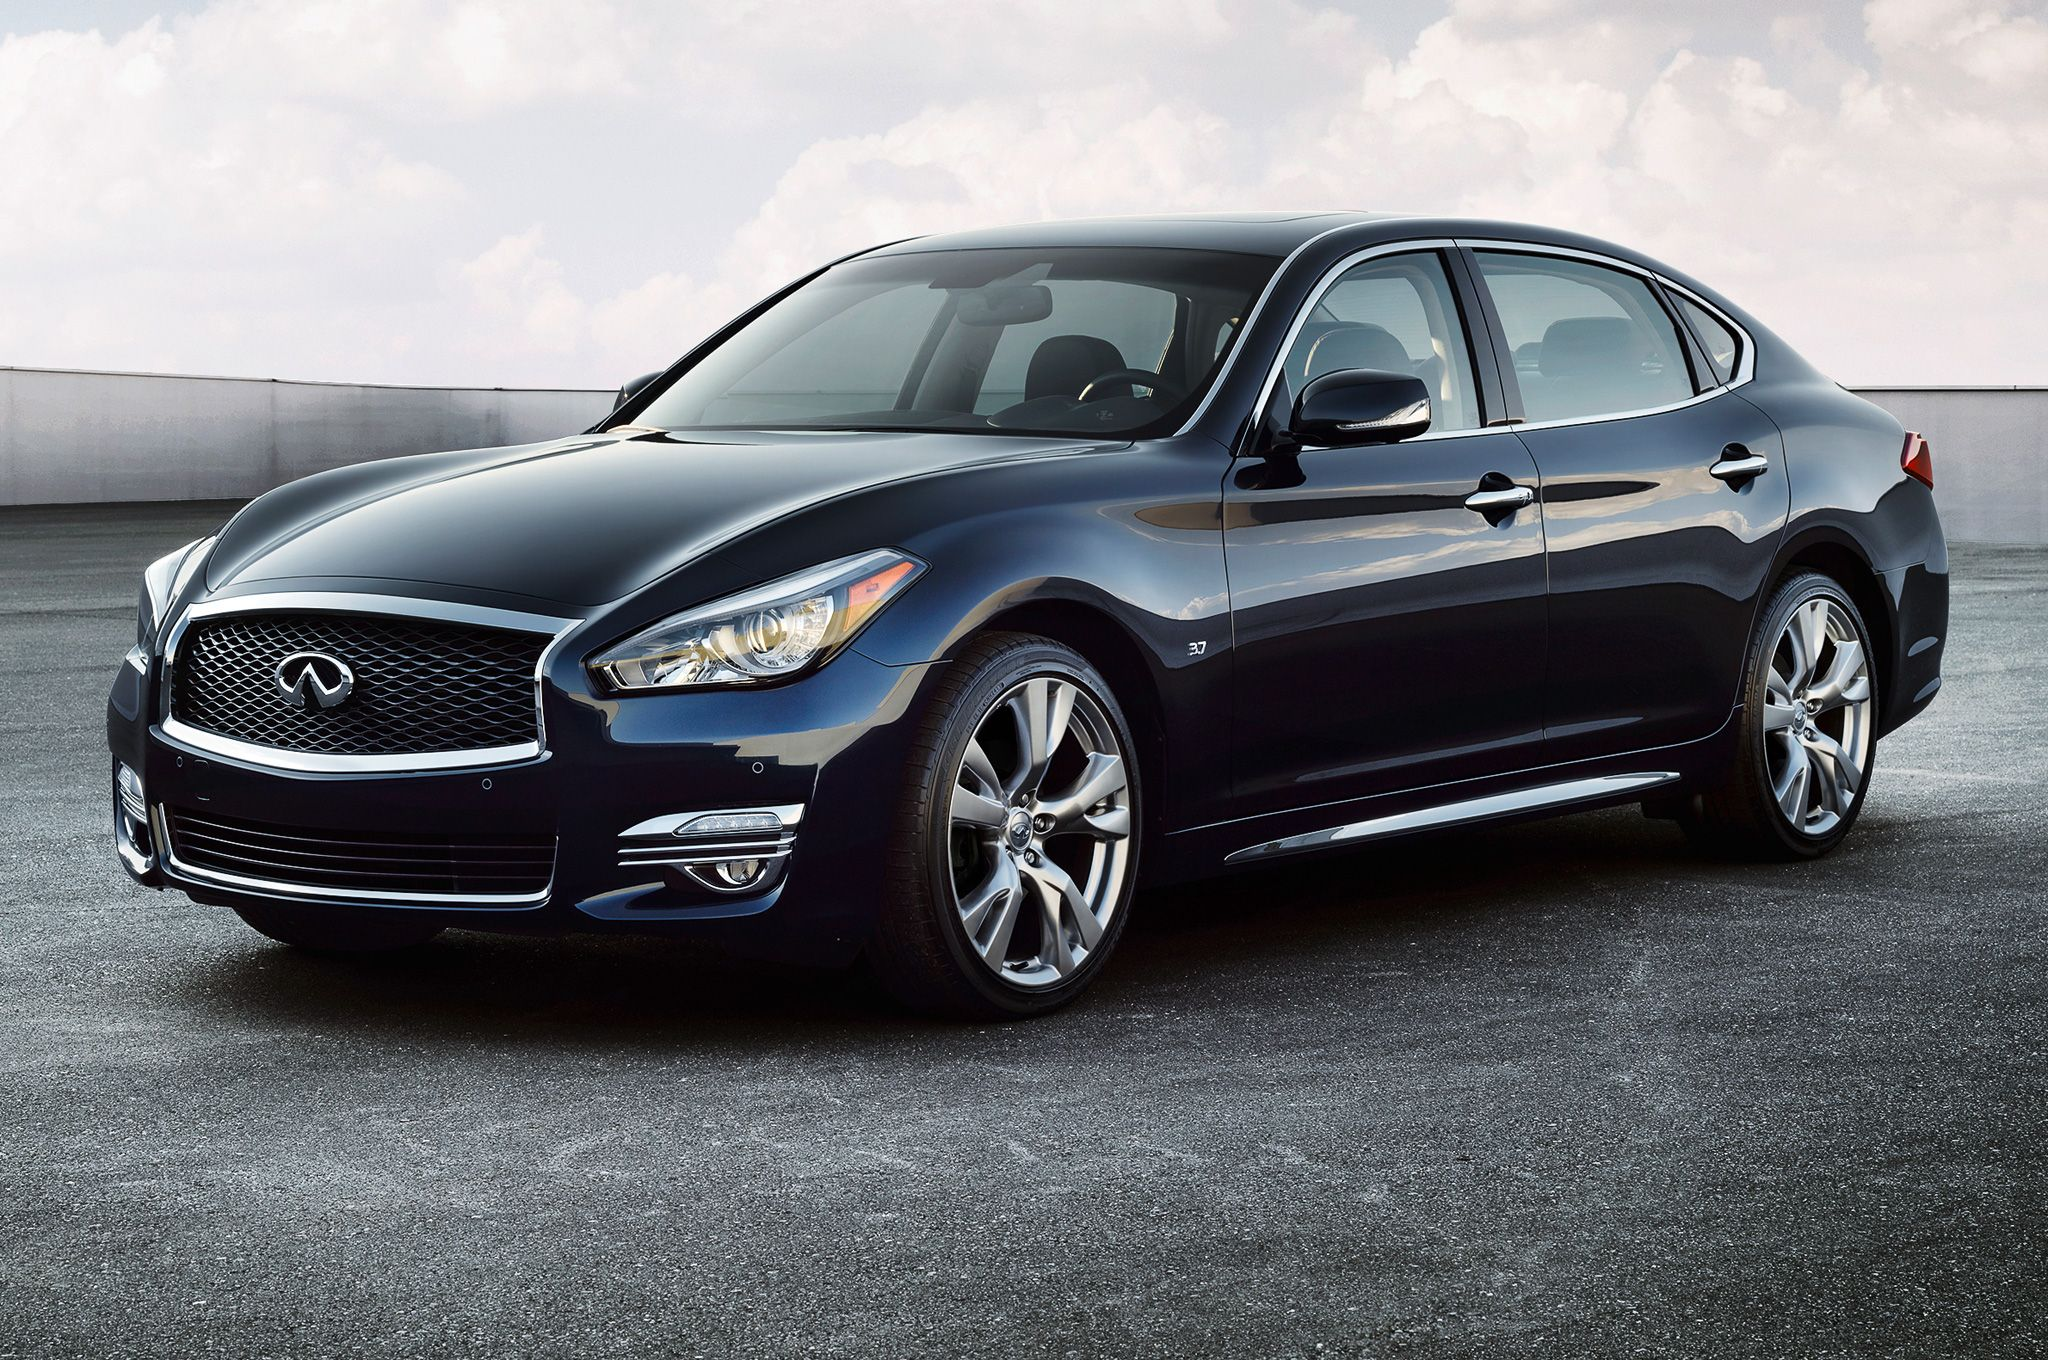 Top Safety Pick 2014 Carsfera 2015 Infiniti Best Luxury Sports Car Luxury Sedan